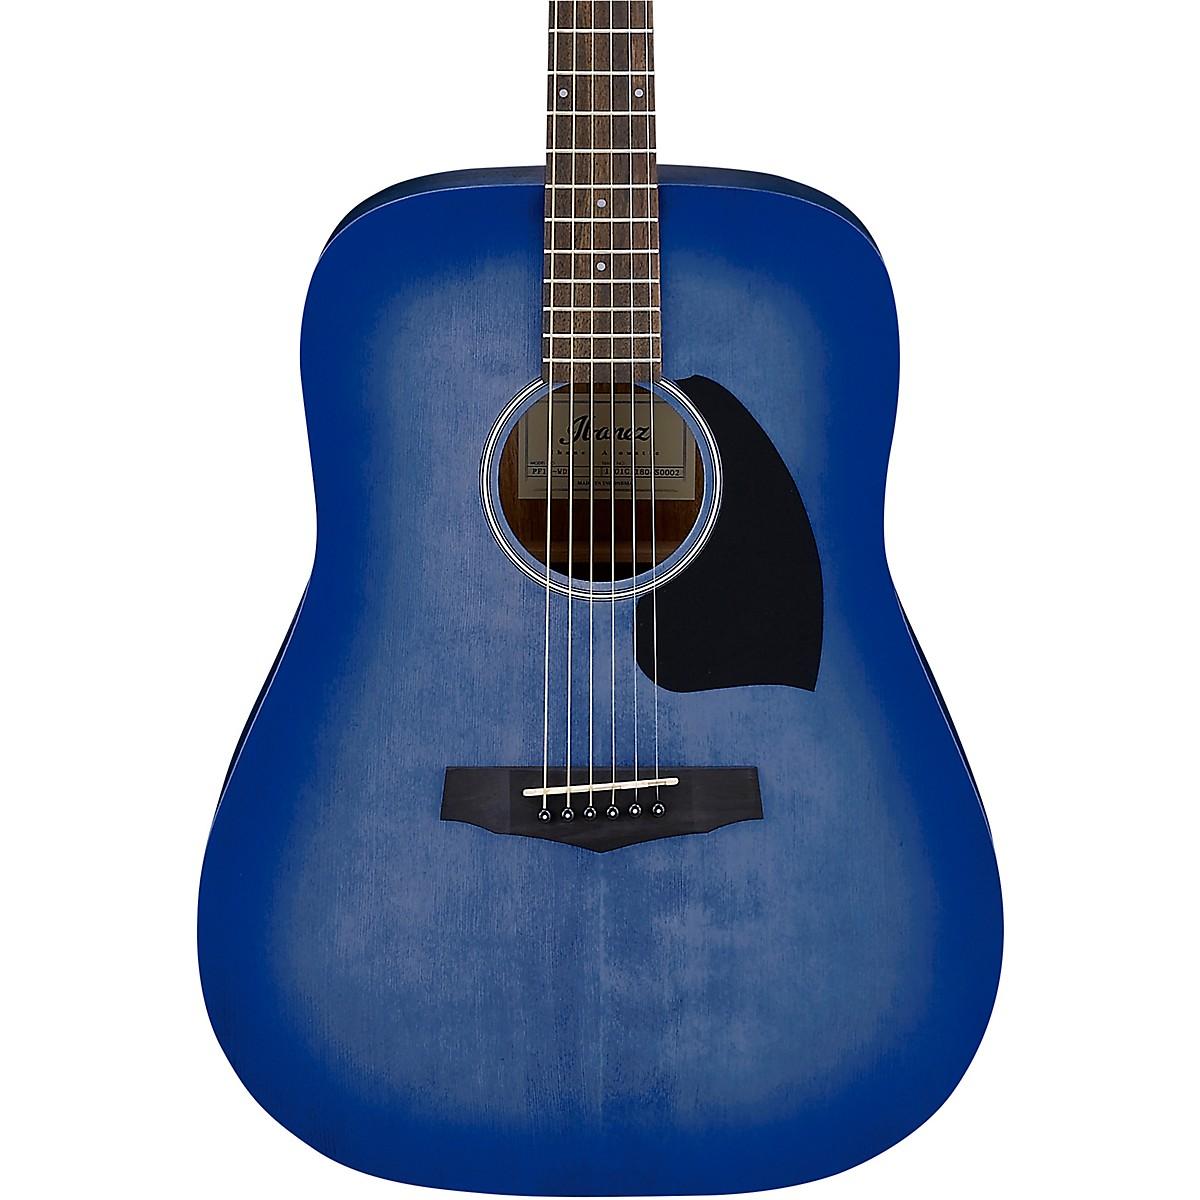 Ibanez PF18WDB Dreadnought Acoustic Guitar